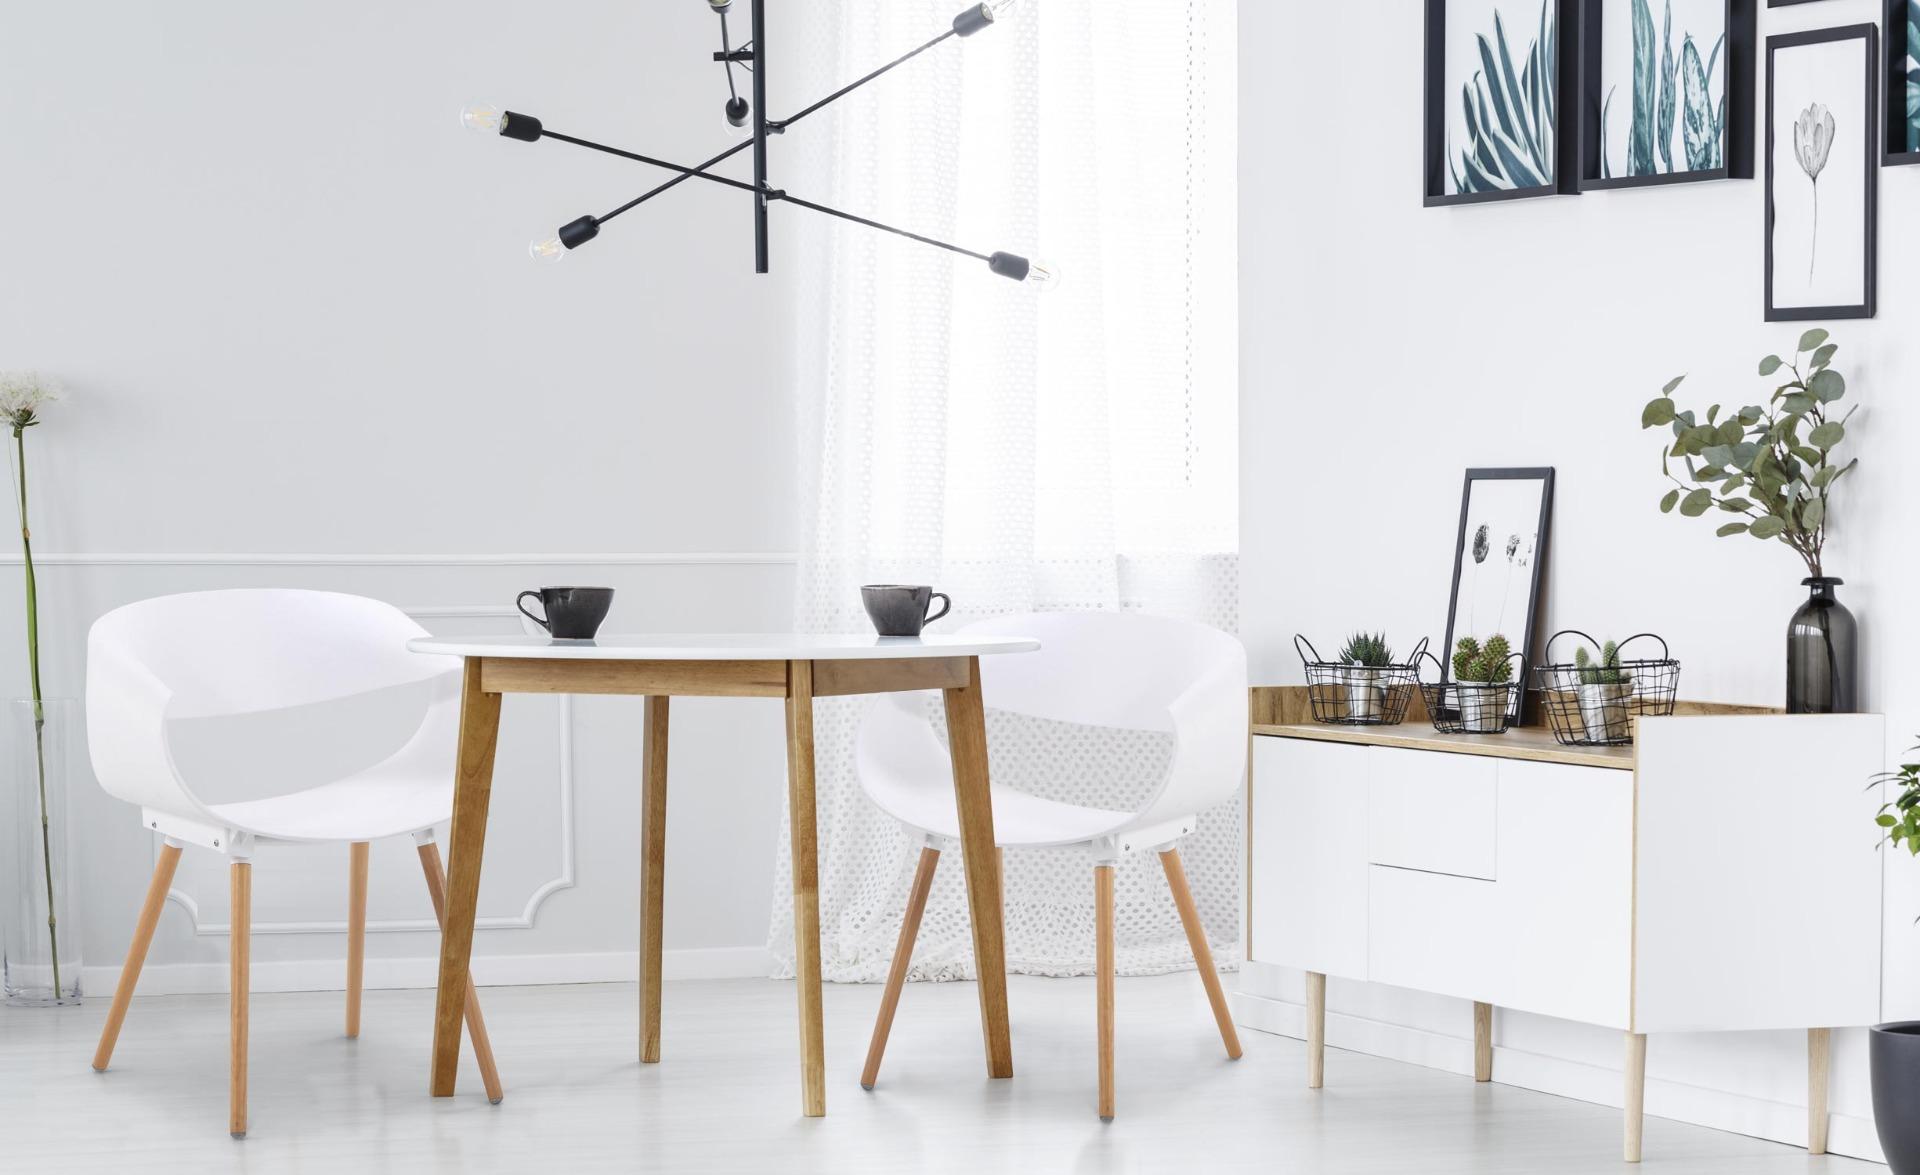 Lot de 2 chaises scandinaves design Zenata Blanc